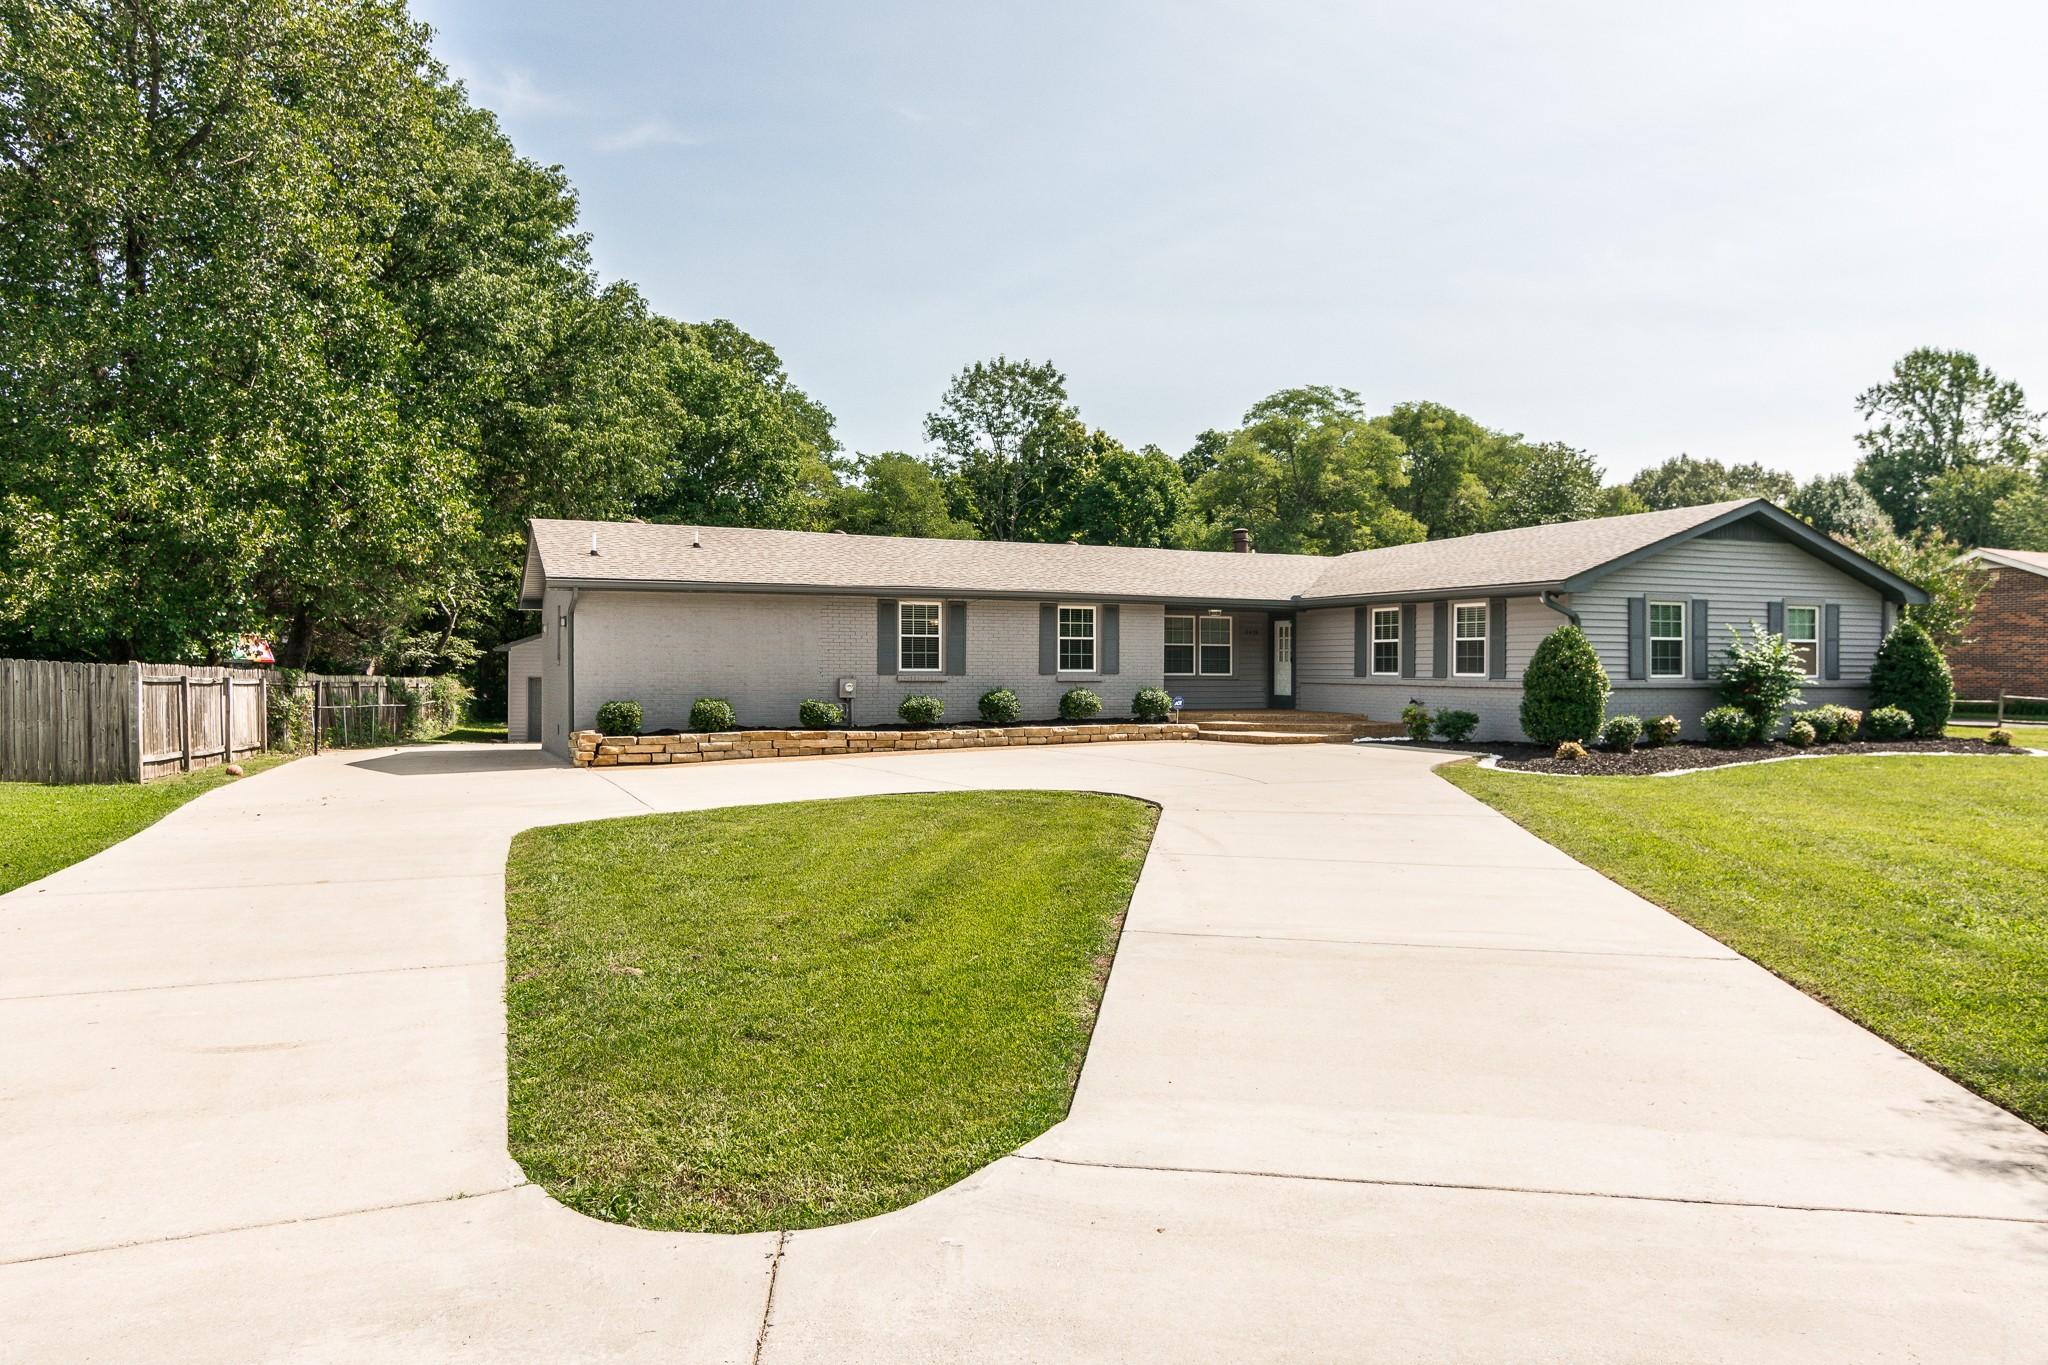 2479 Barwood Dr Property Photo - Greenbrier, TN real estate listing